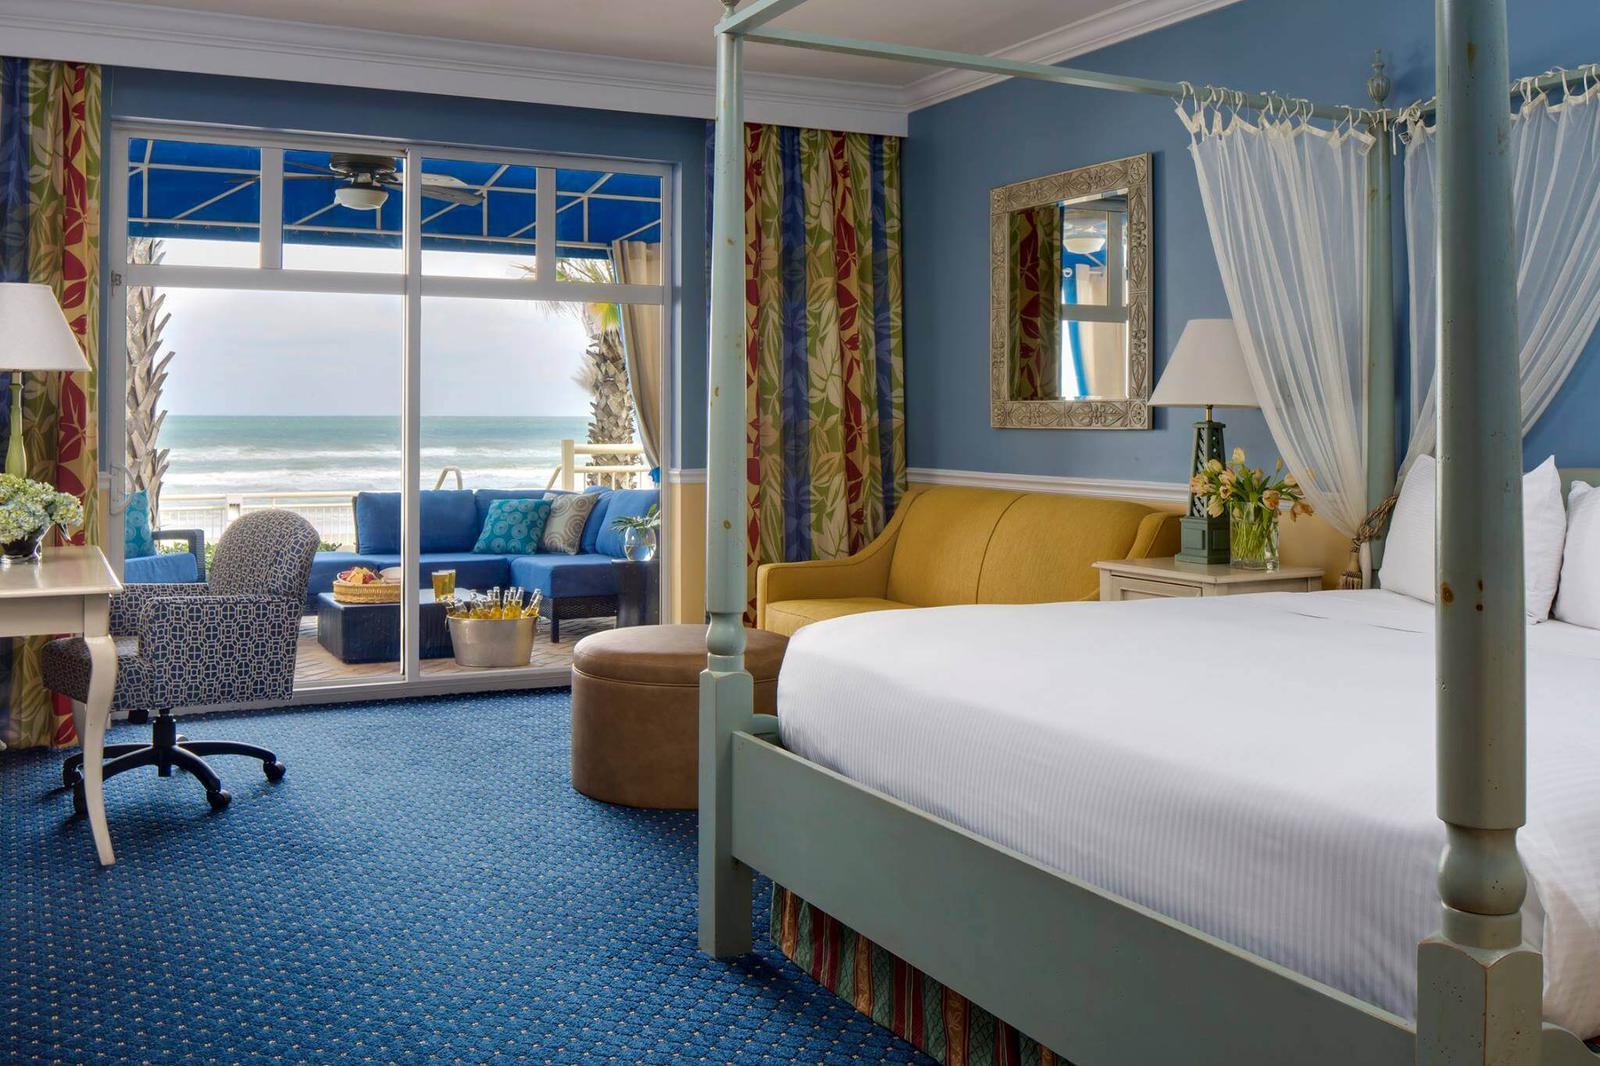 Hotels for NASCAR drivers Daytona Beach